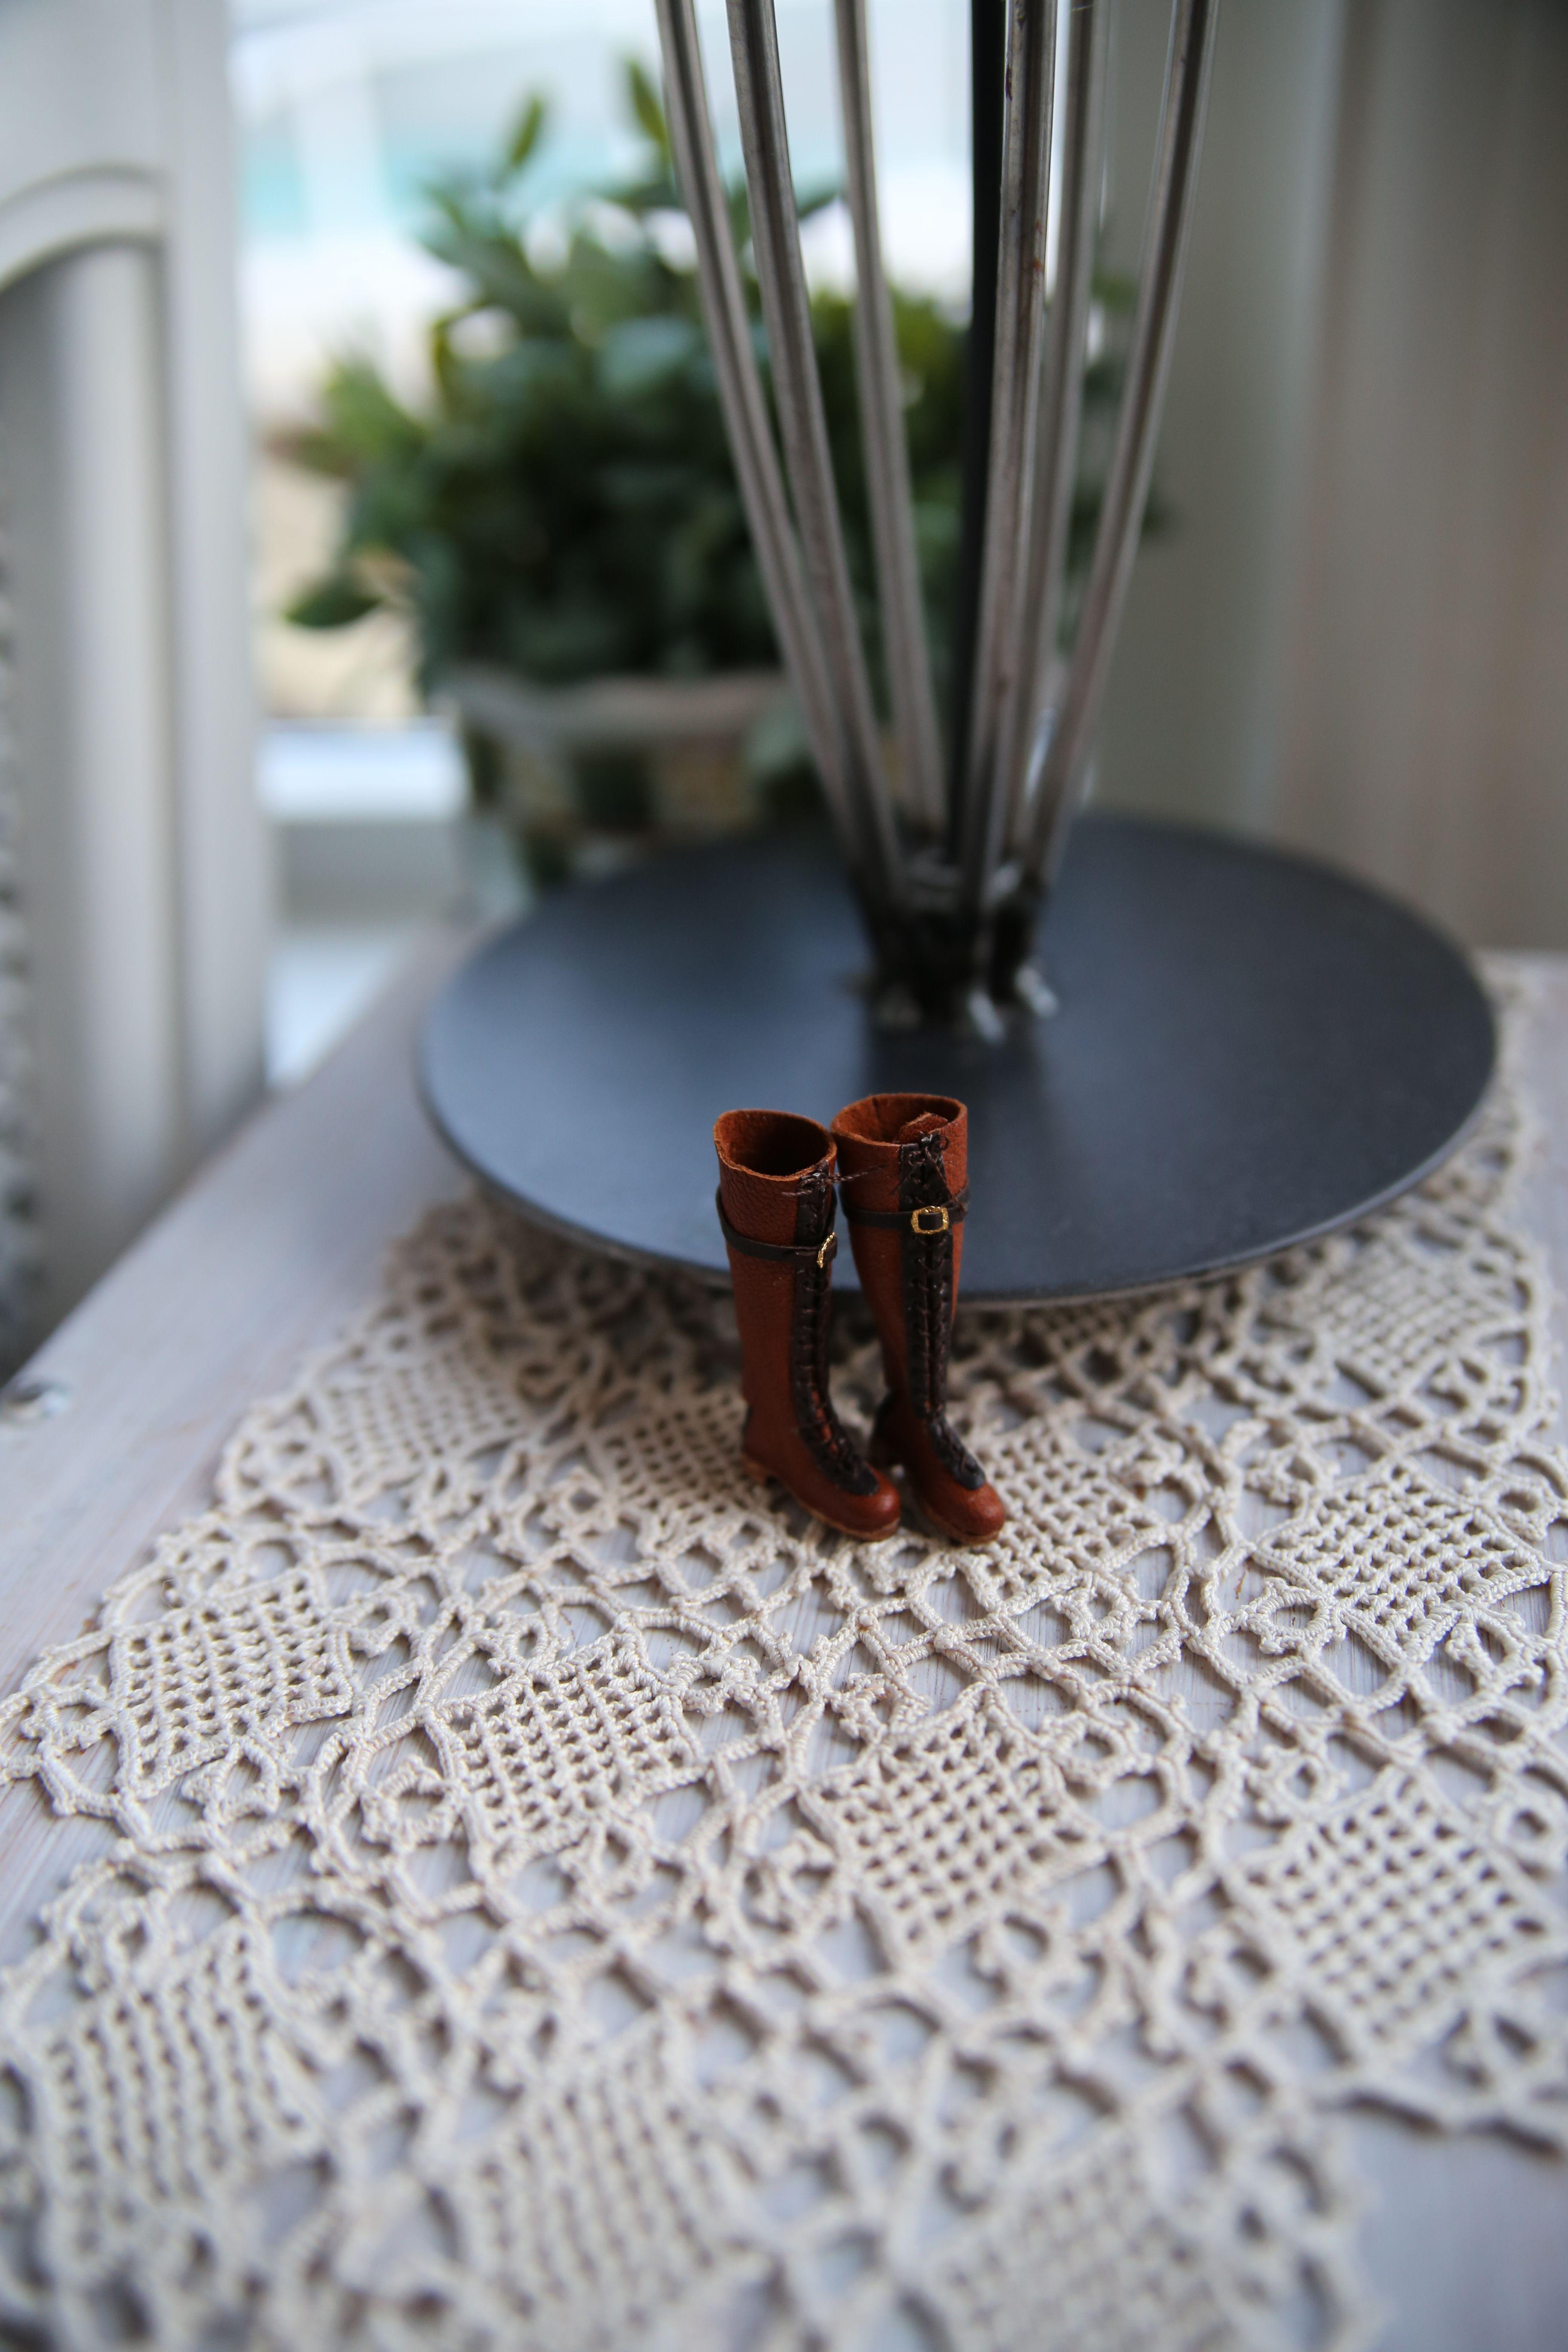 My handmade boots/riding boots :-D